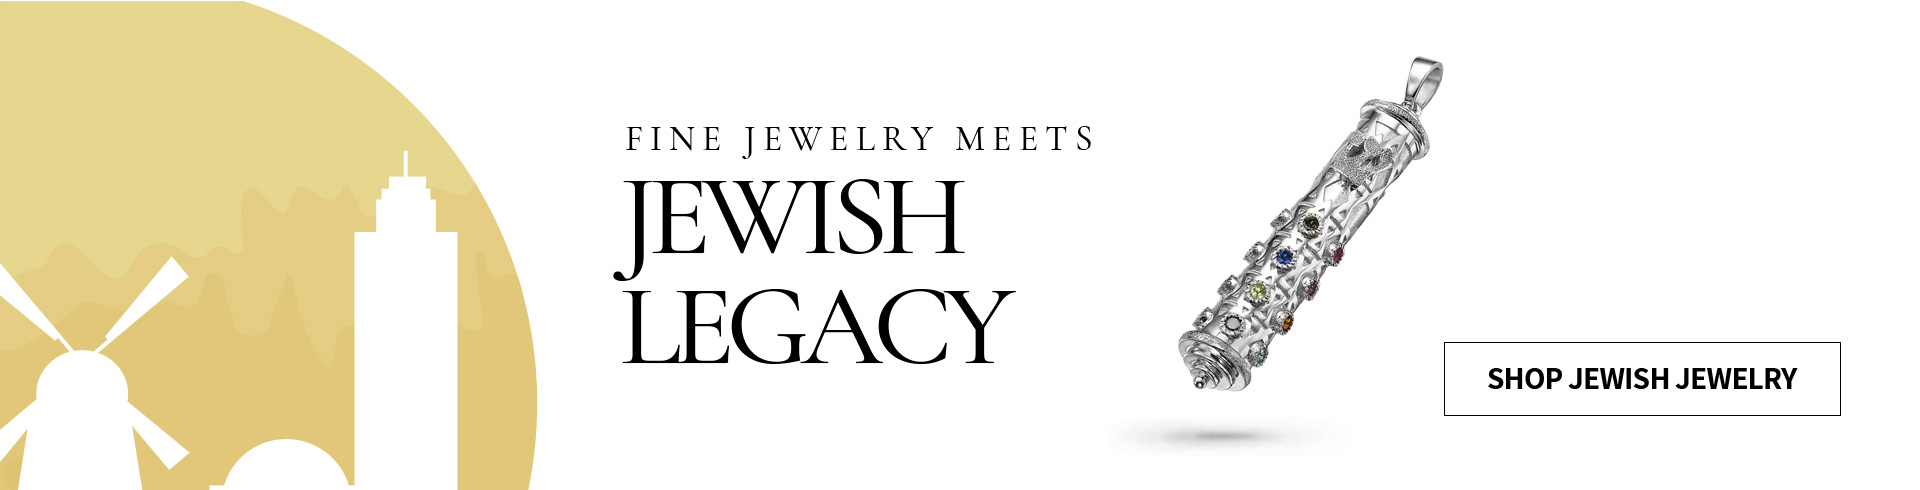 Fine Jewelry meets Jewish Legacy – Desktop Banner